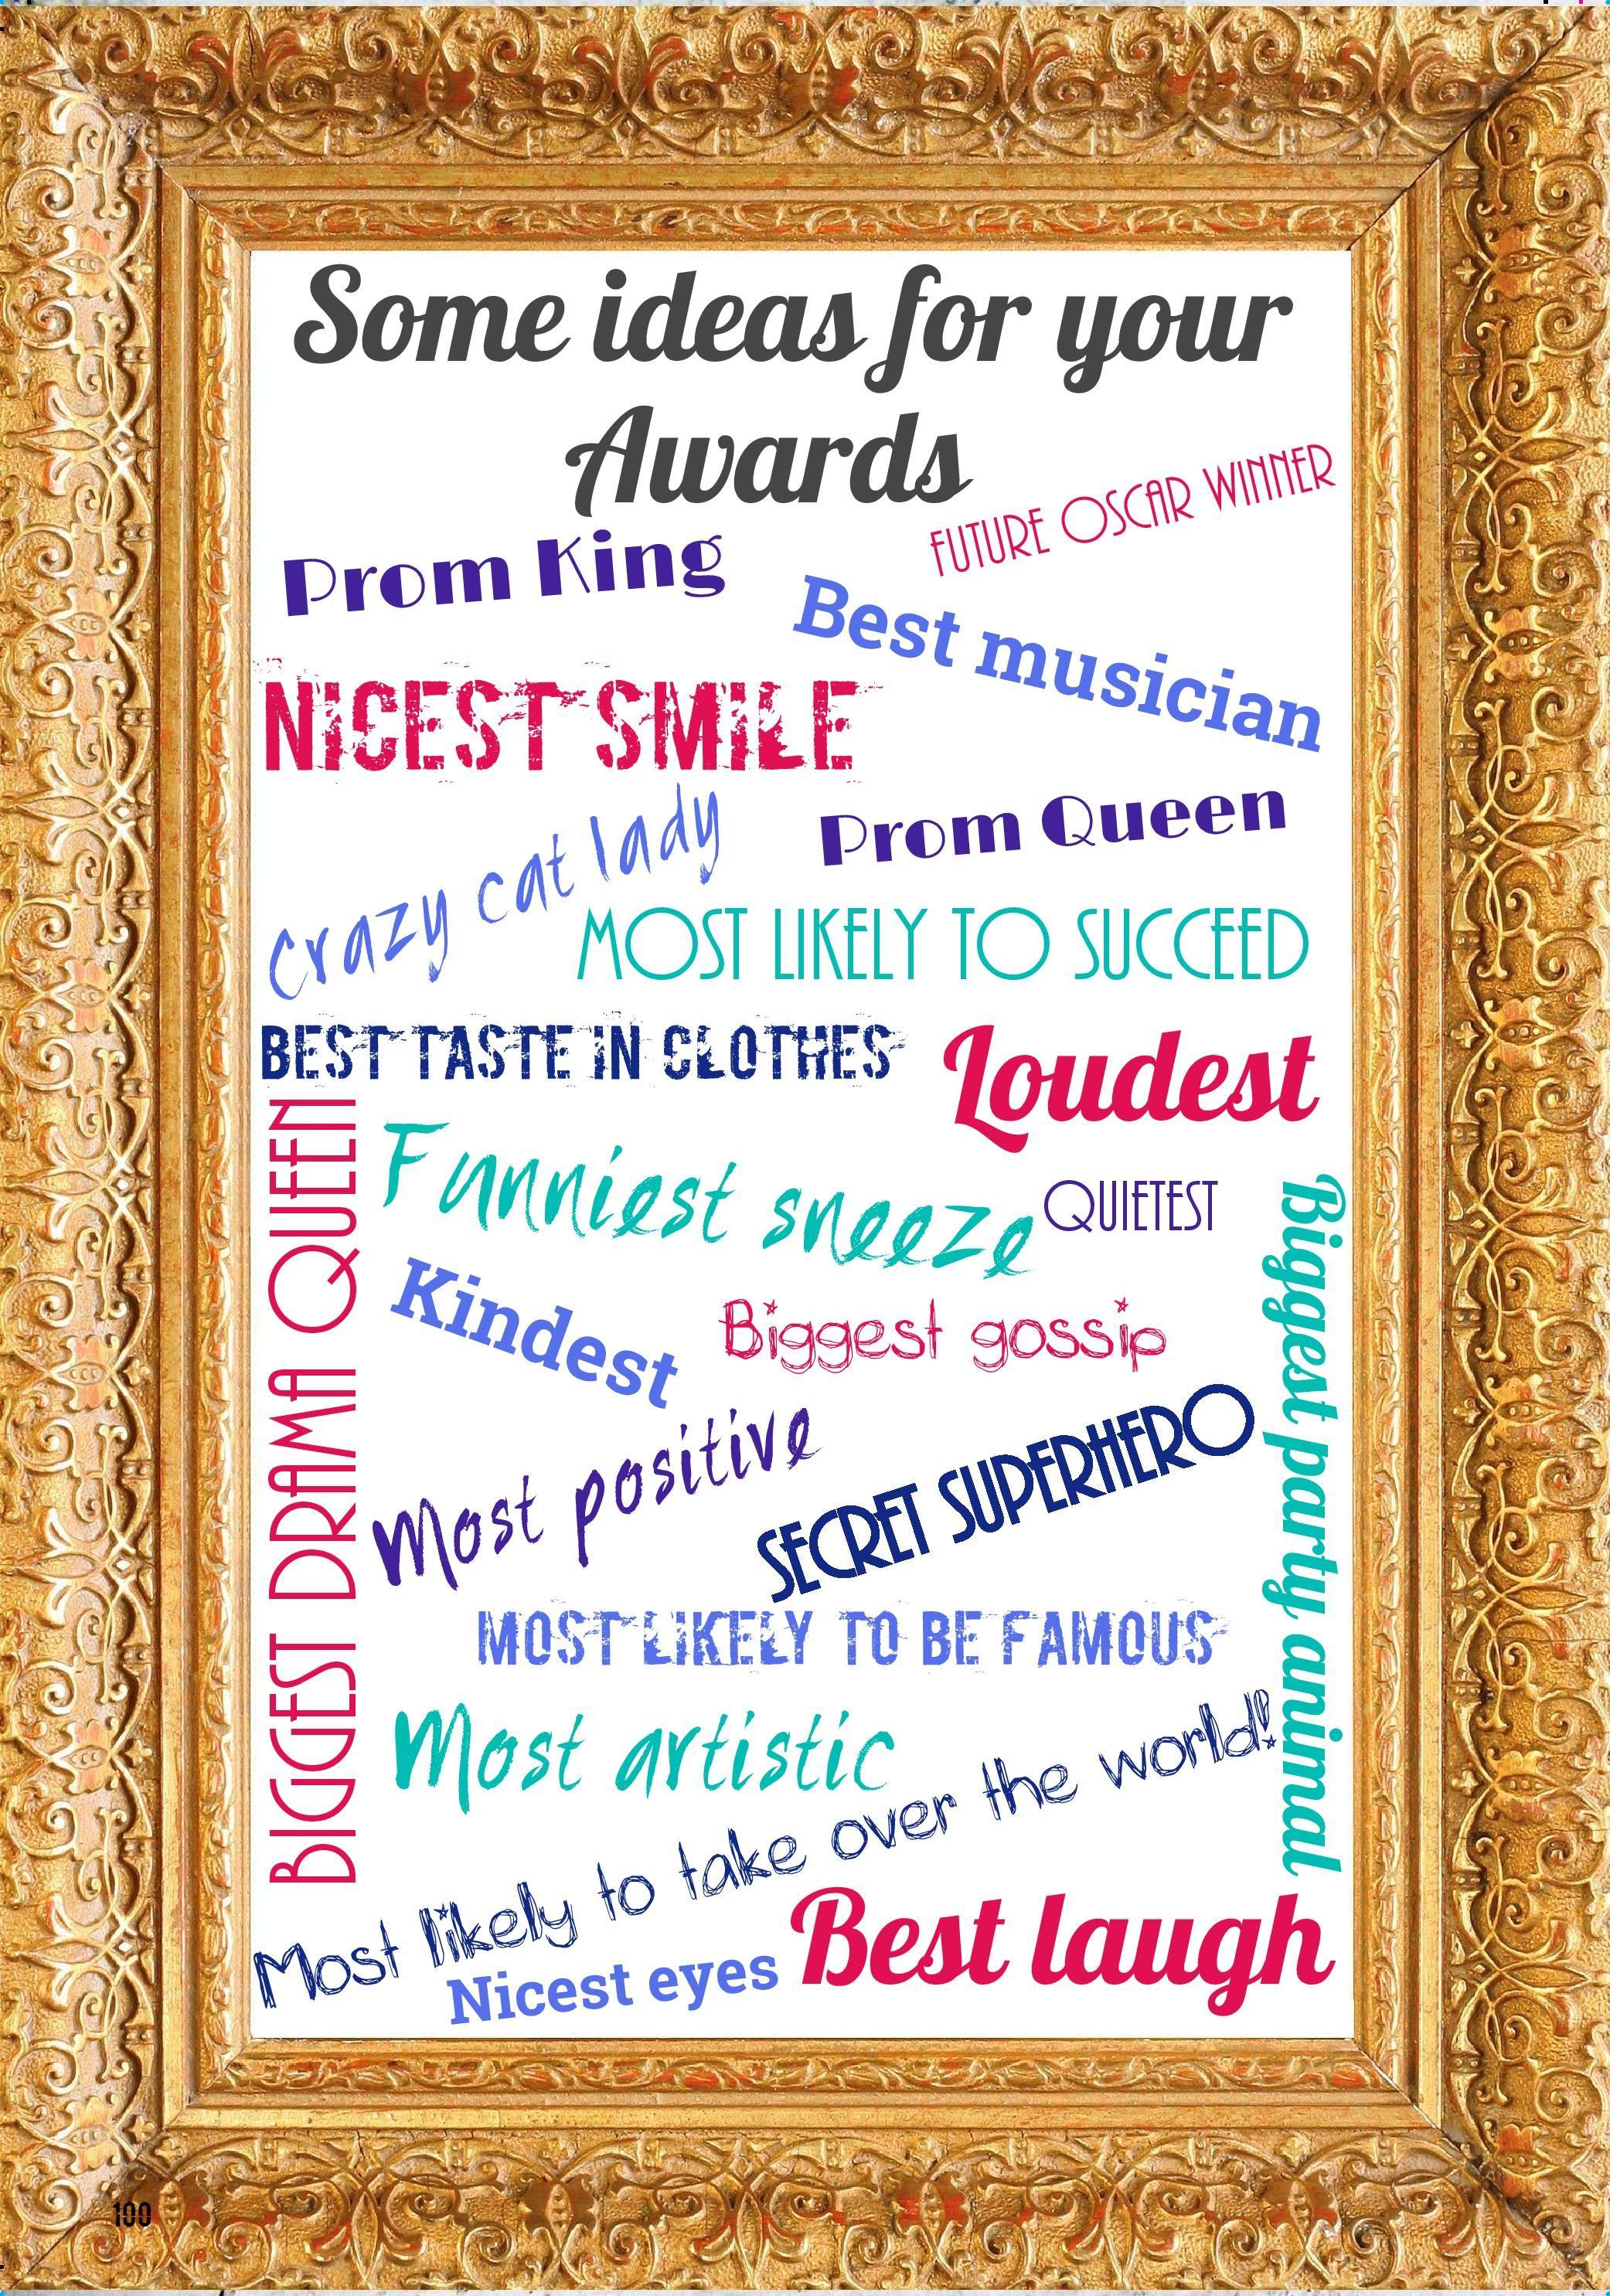 Awards Ideas For Blog Page 001 Funny Awards Award Ideas Fun Awards Fun award ideas for students